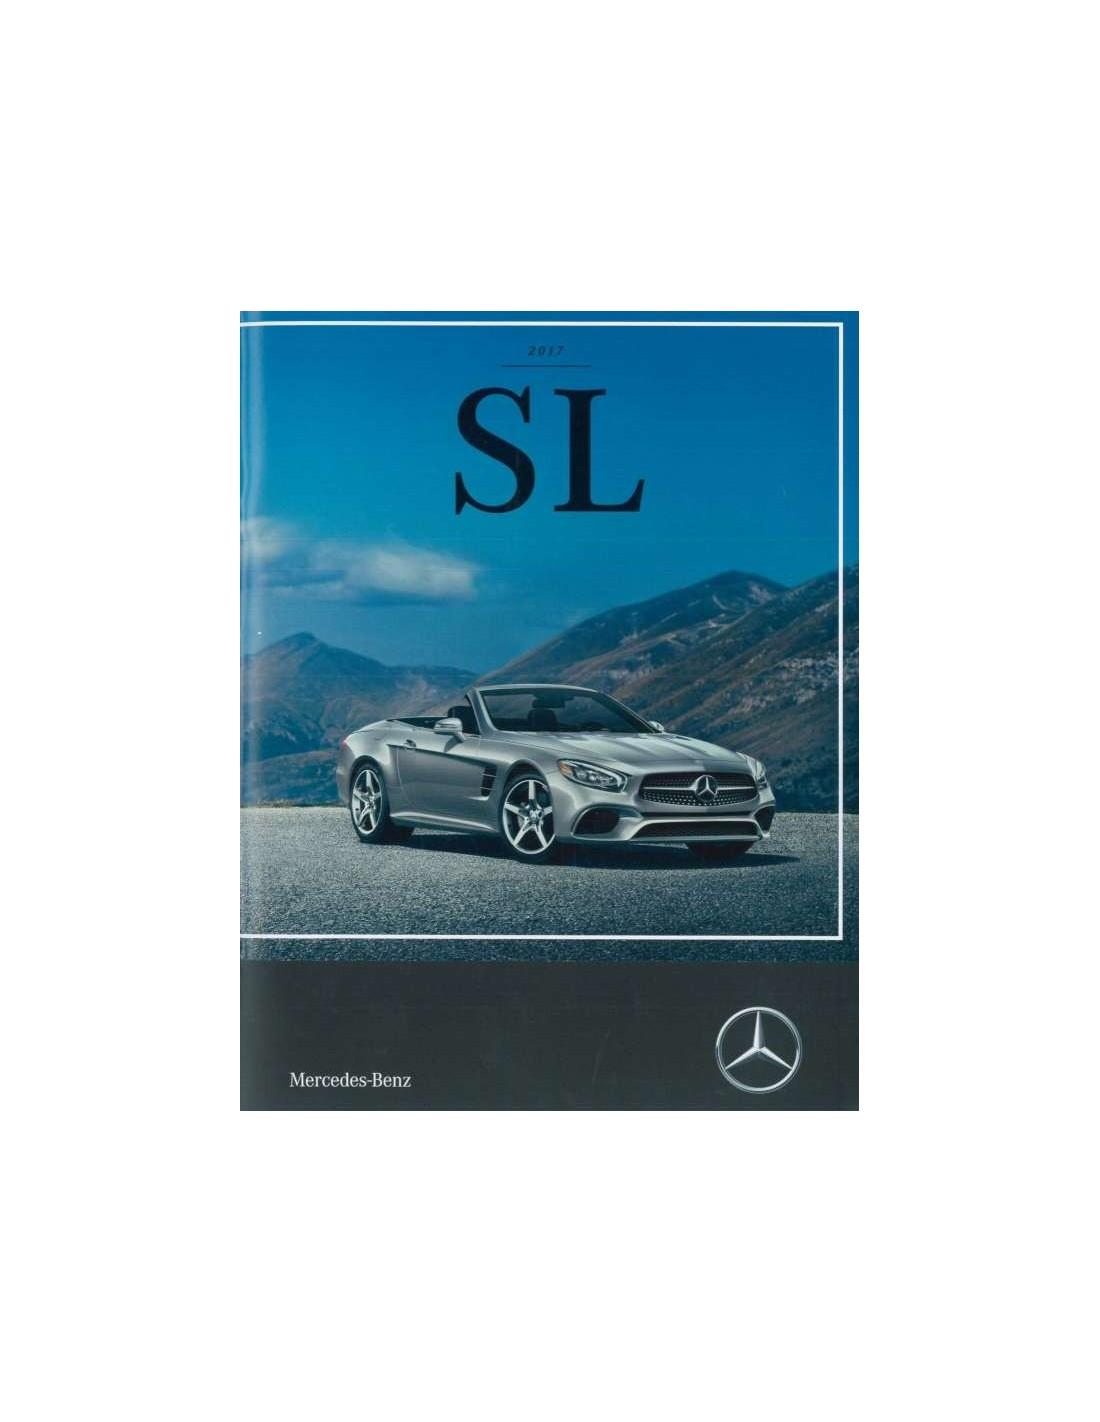 Bmw Z3 Brochure: 2017 MERCEDES BENZ SL KLASSE BROCHURE ENGELS USA